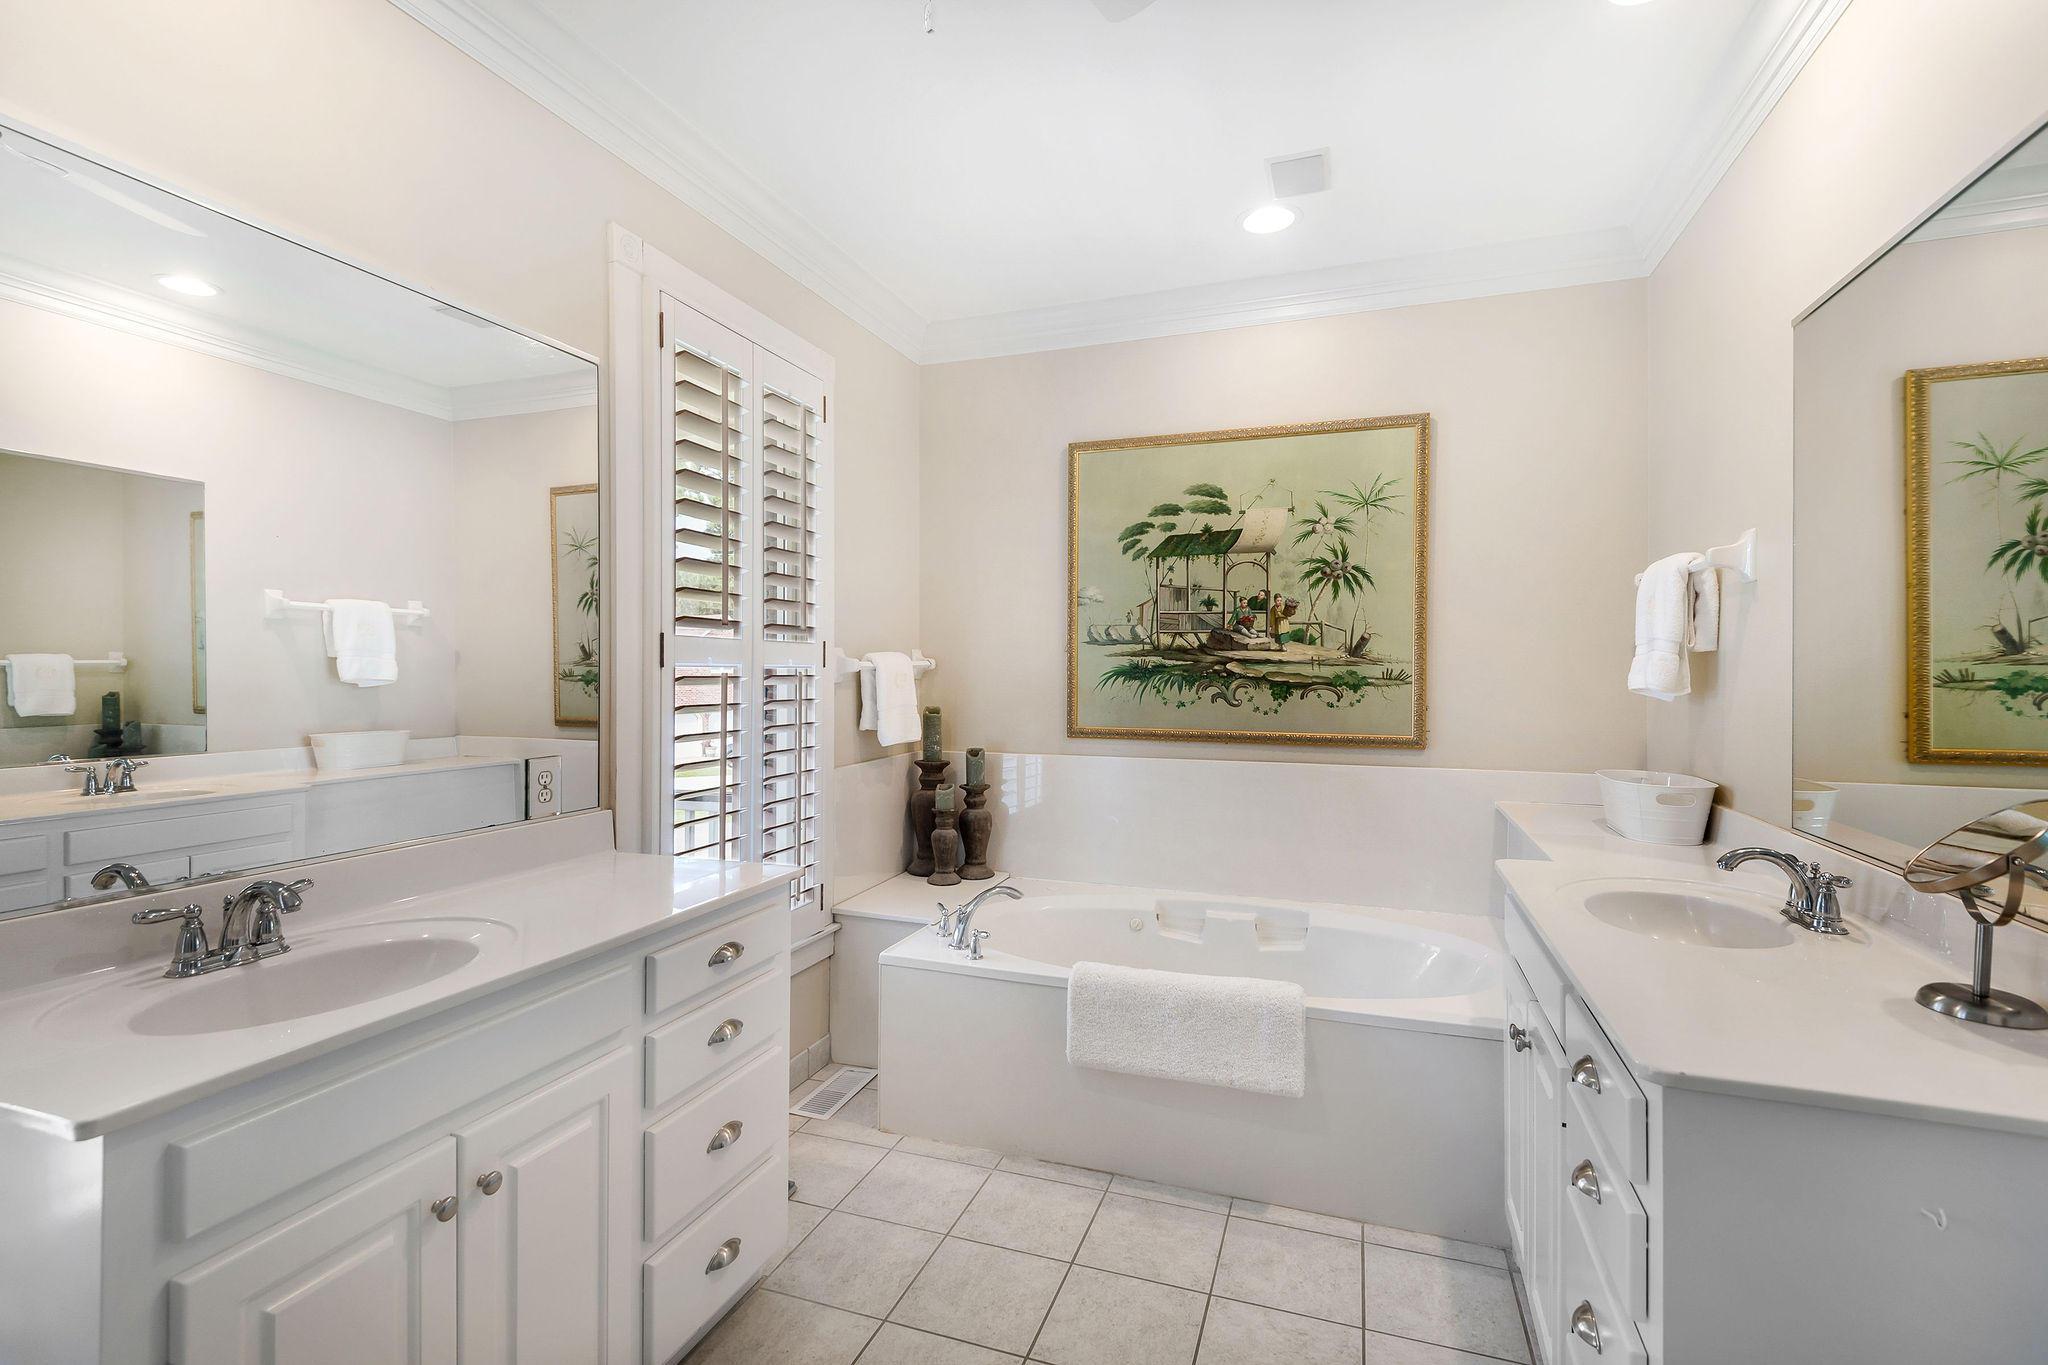 Country Club II Homes For Sale - 1482 Burningtree, Charleston, SC - 36